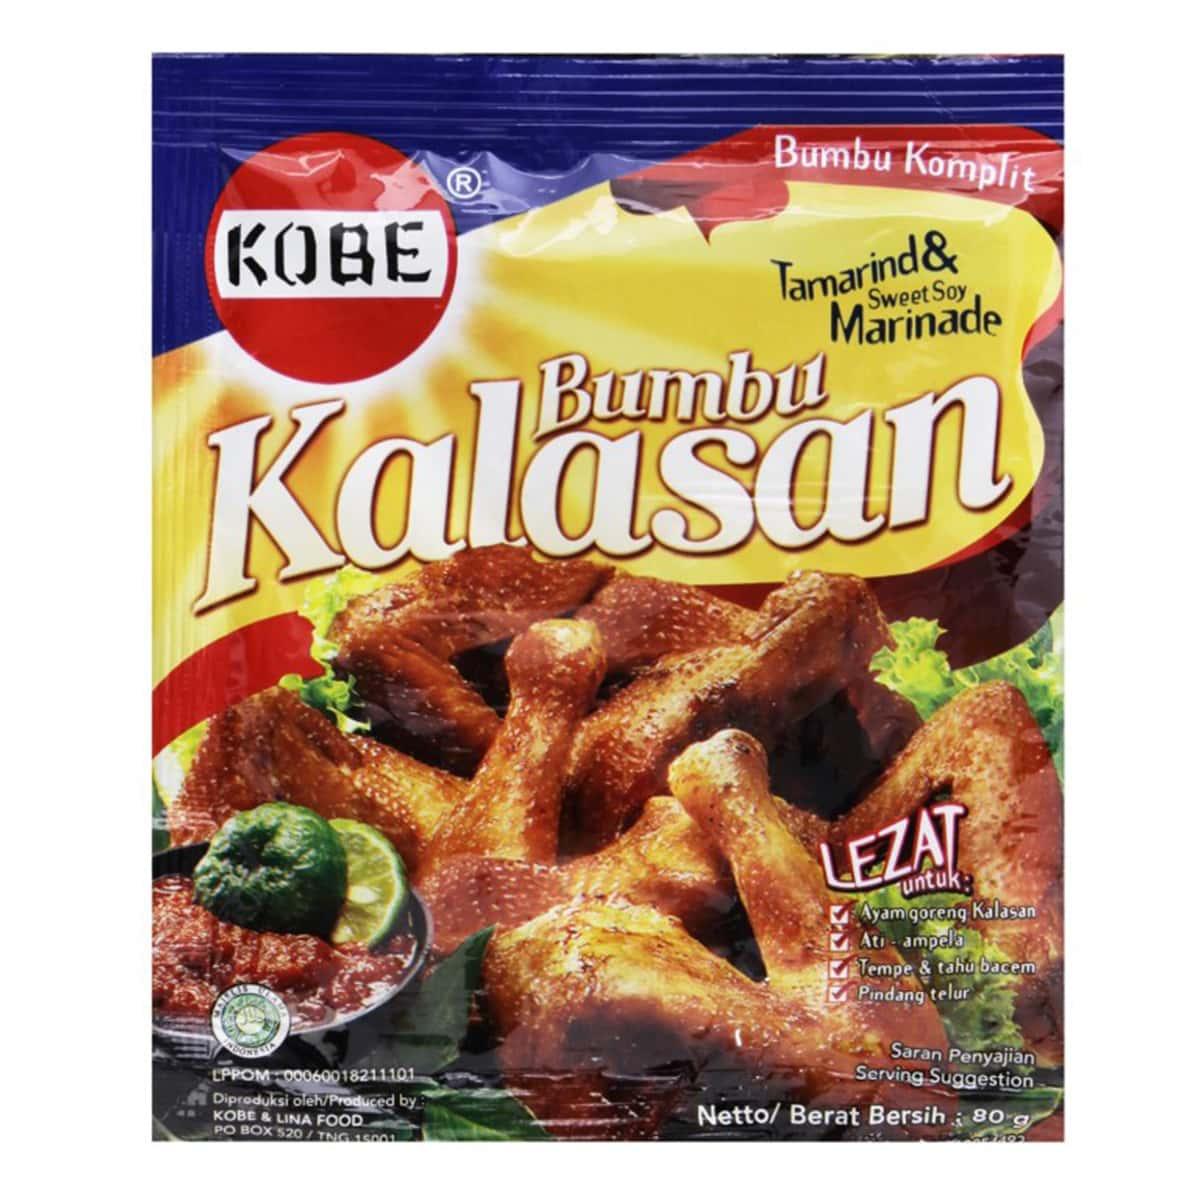 Buy Kobe Bumbu Kalasan (Tamarind and Sweet Soy Marinade Mix) - 80 gm